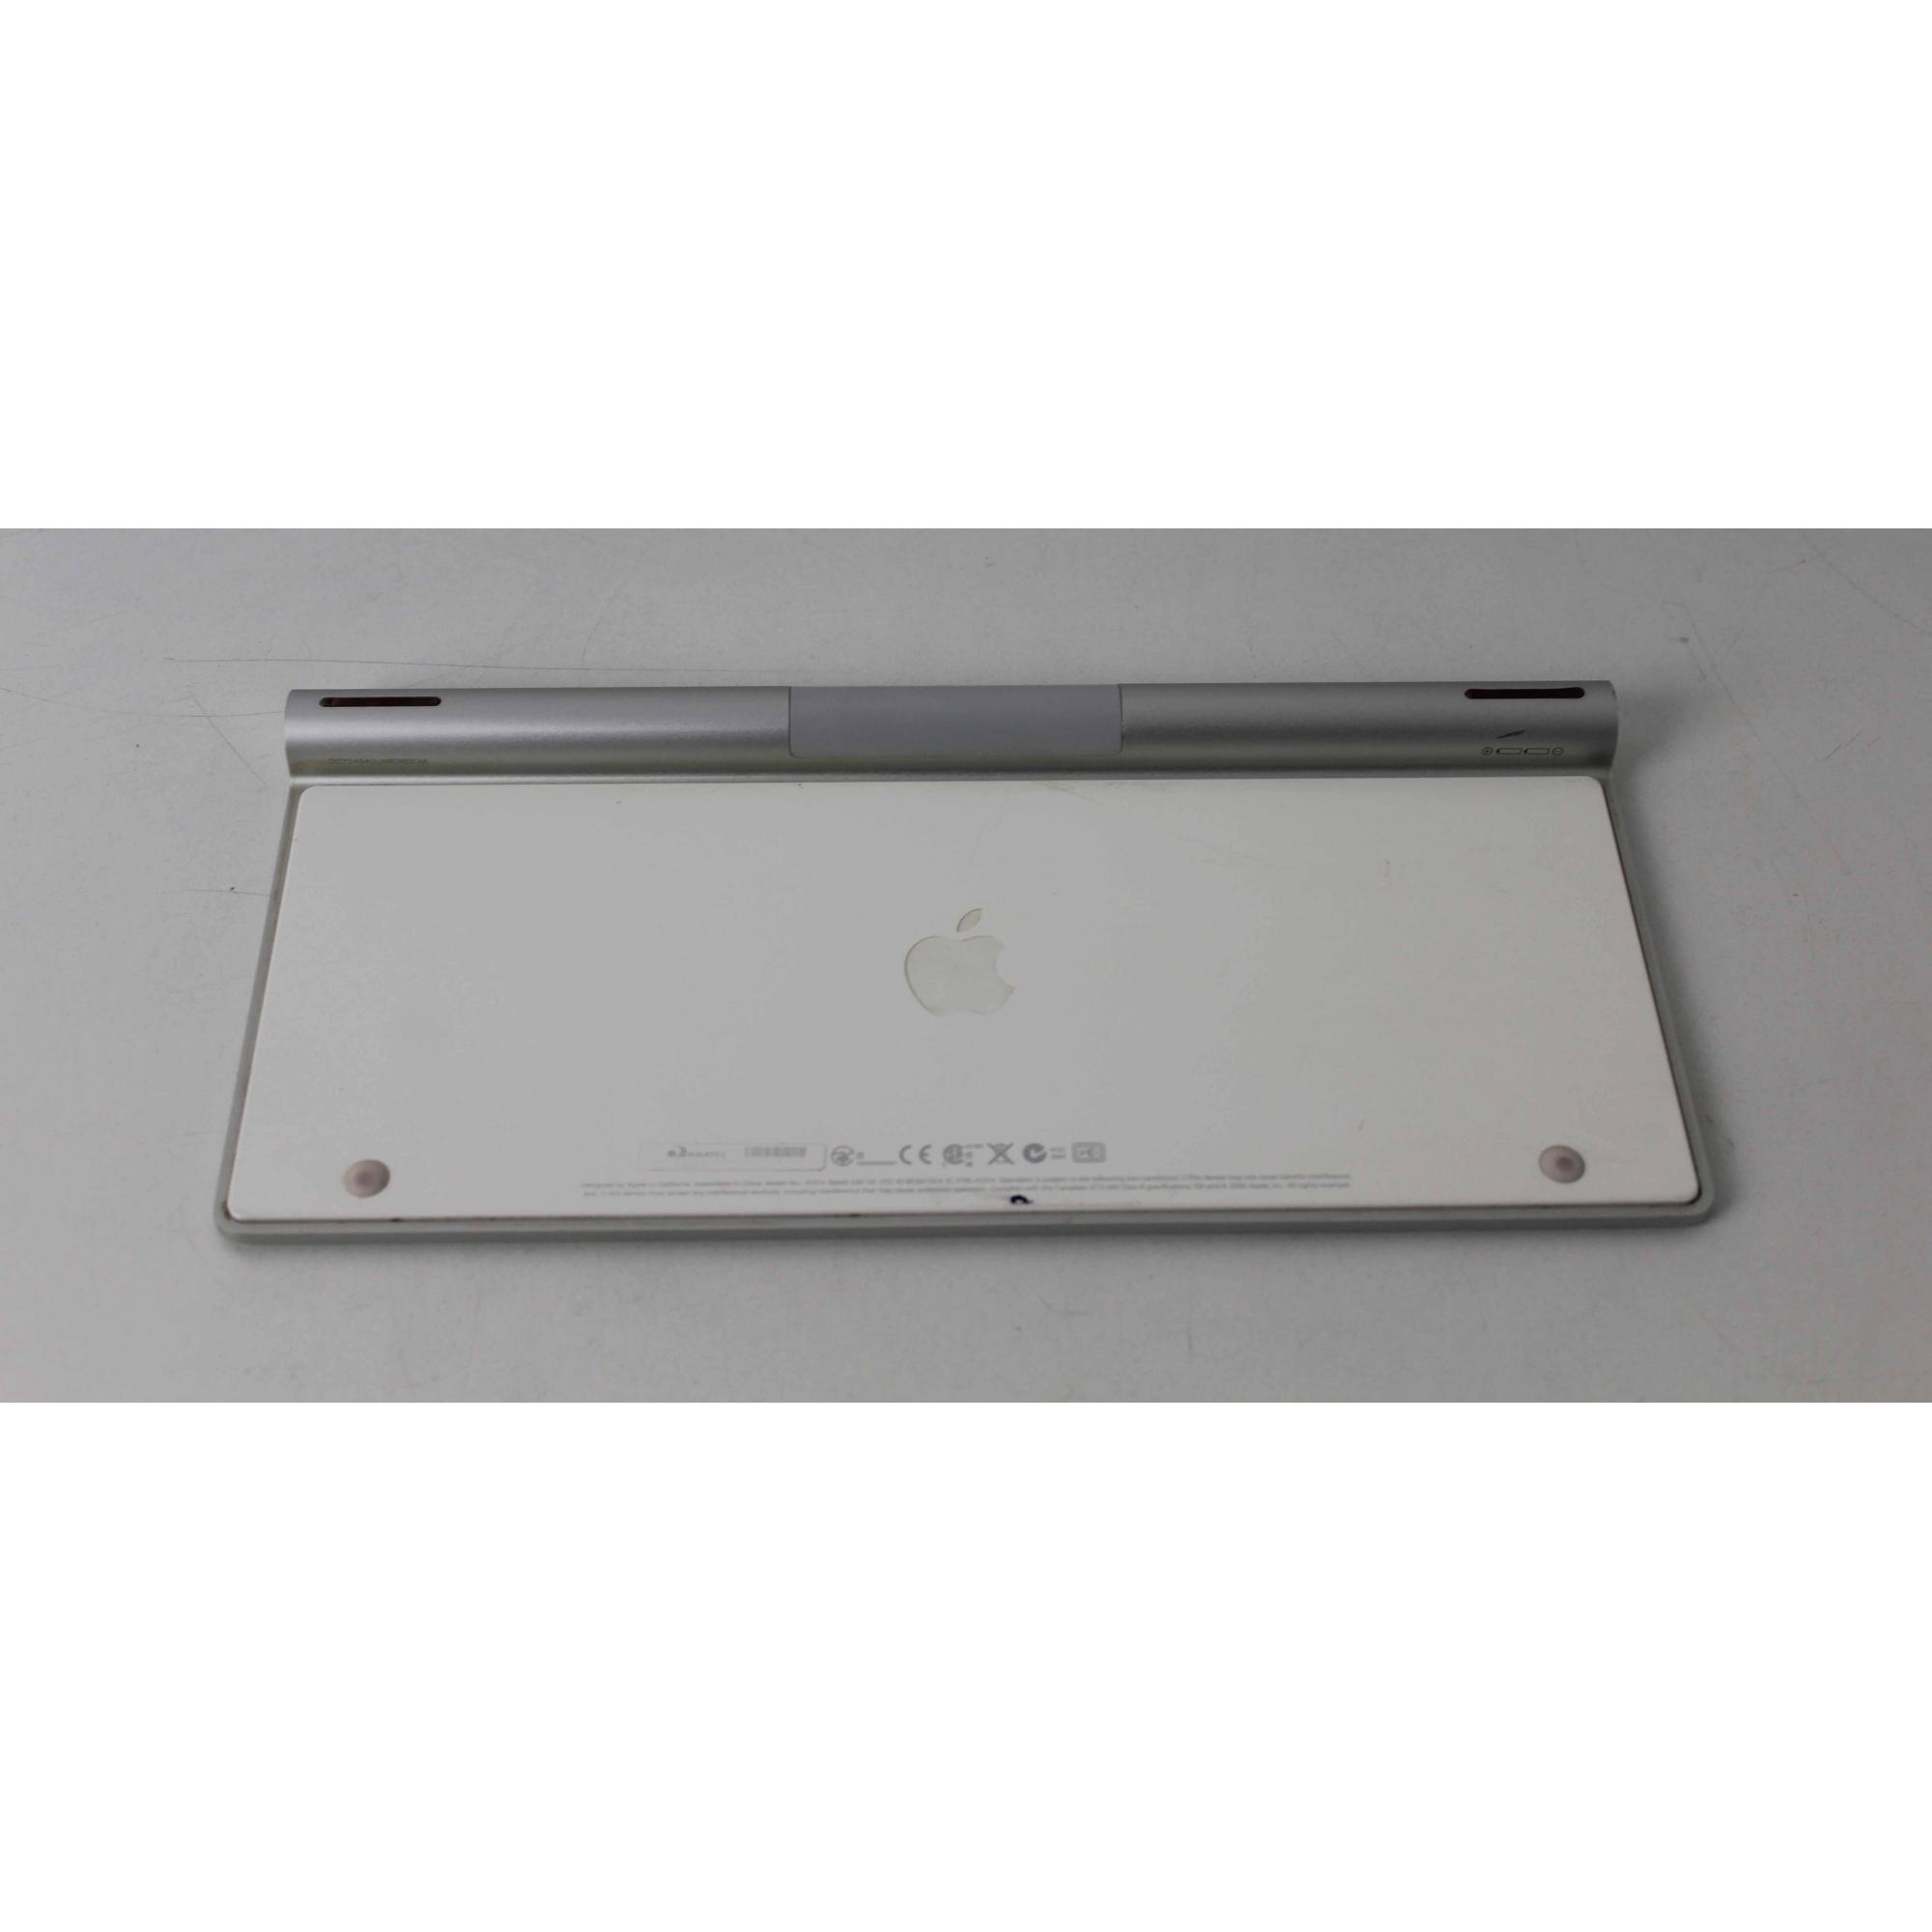 Magic Keyboard A1314 - Wireless